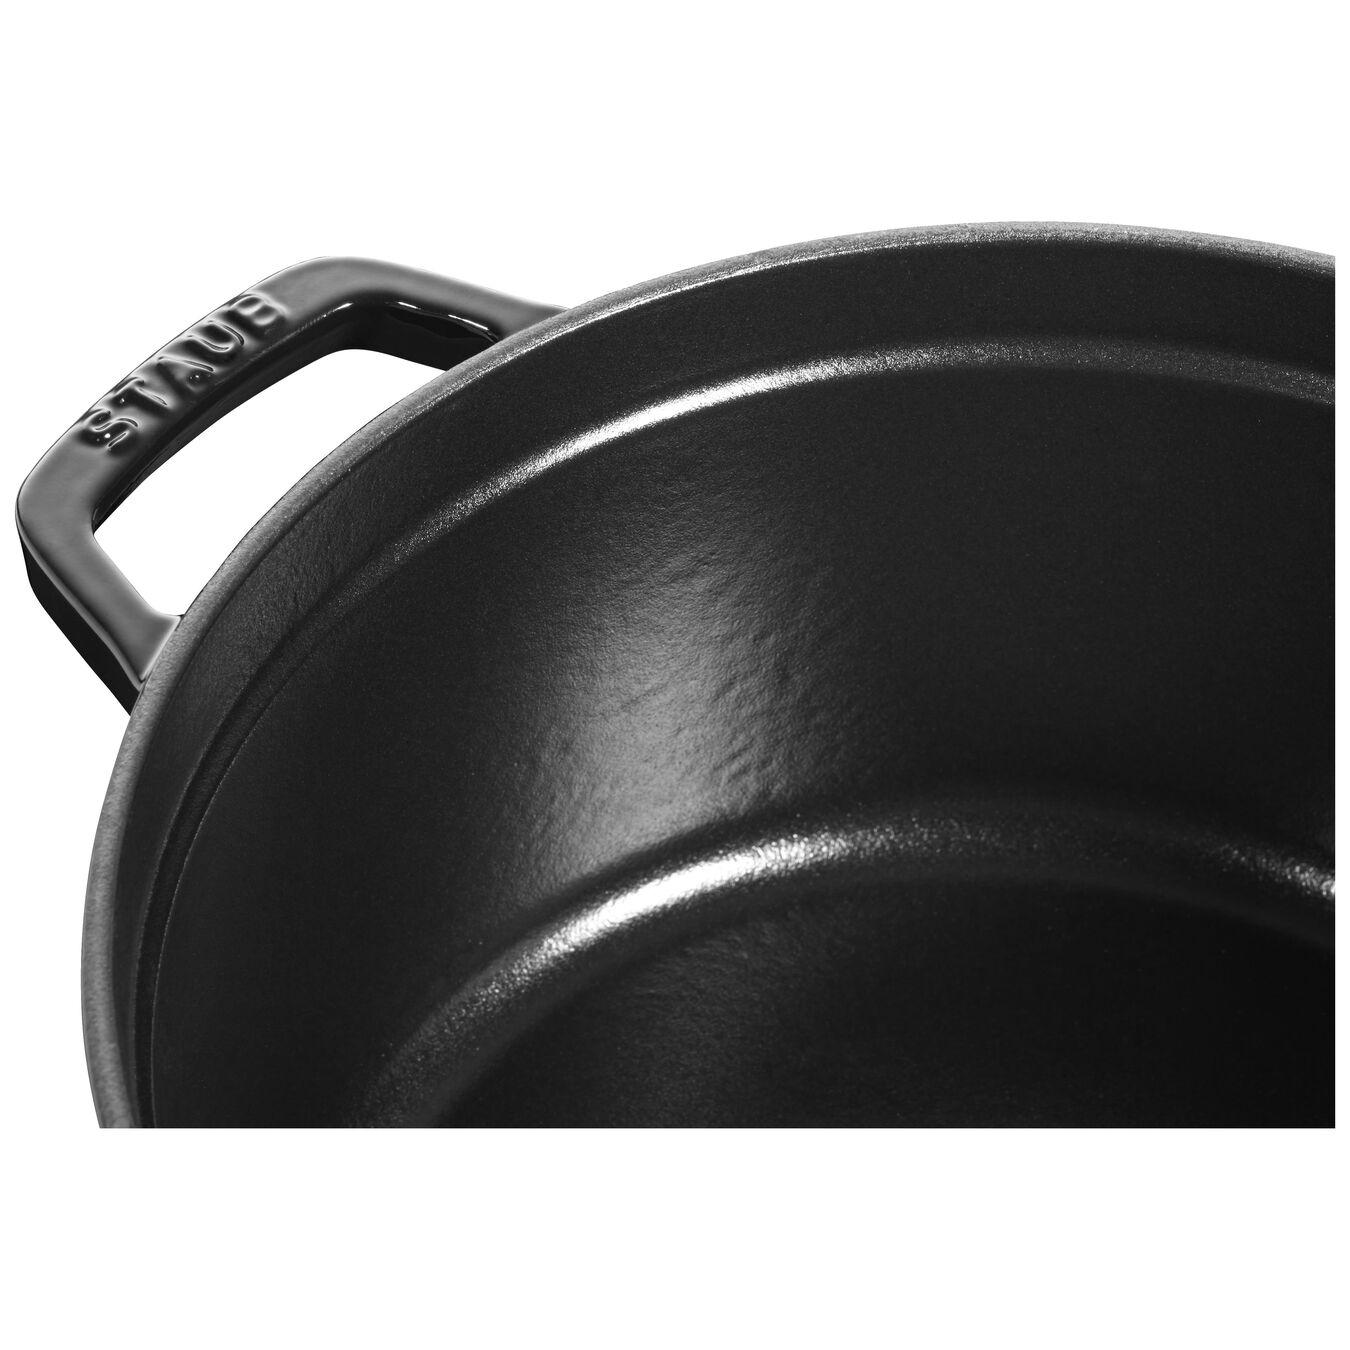 3.75 l Cast iron round Cocotte, Shiny-Black,,large 2